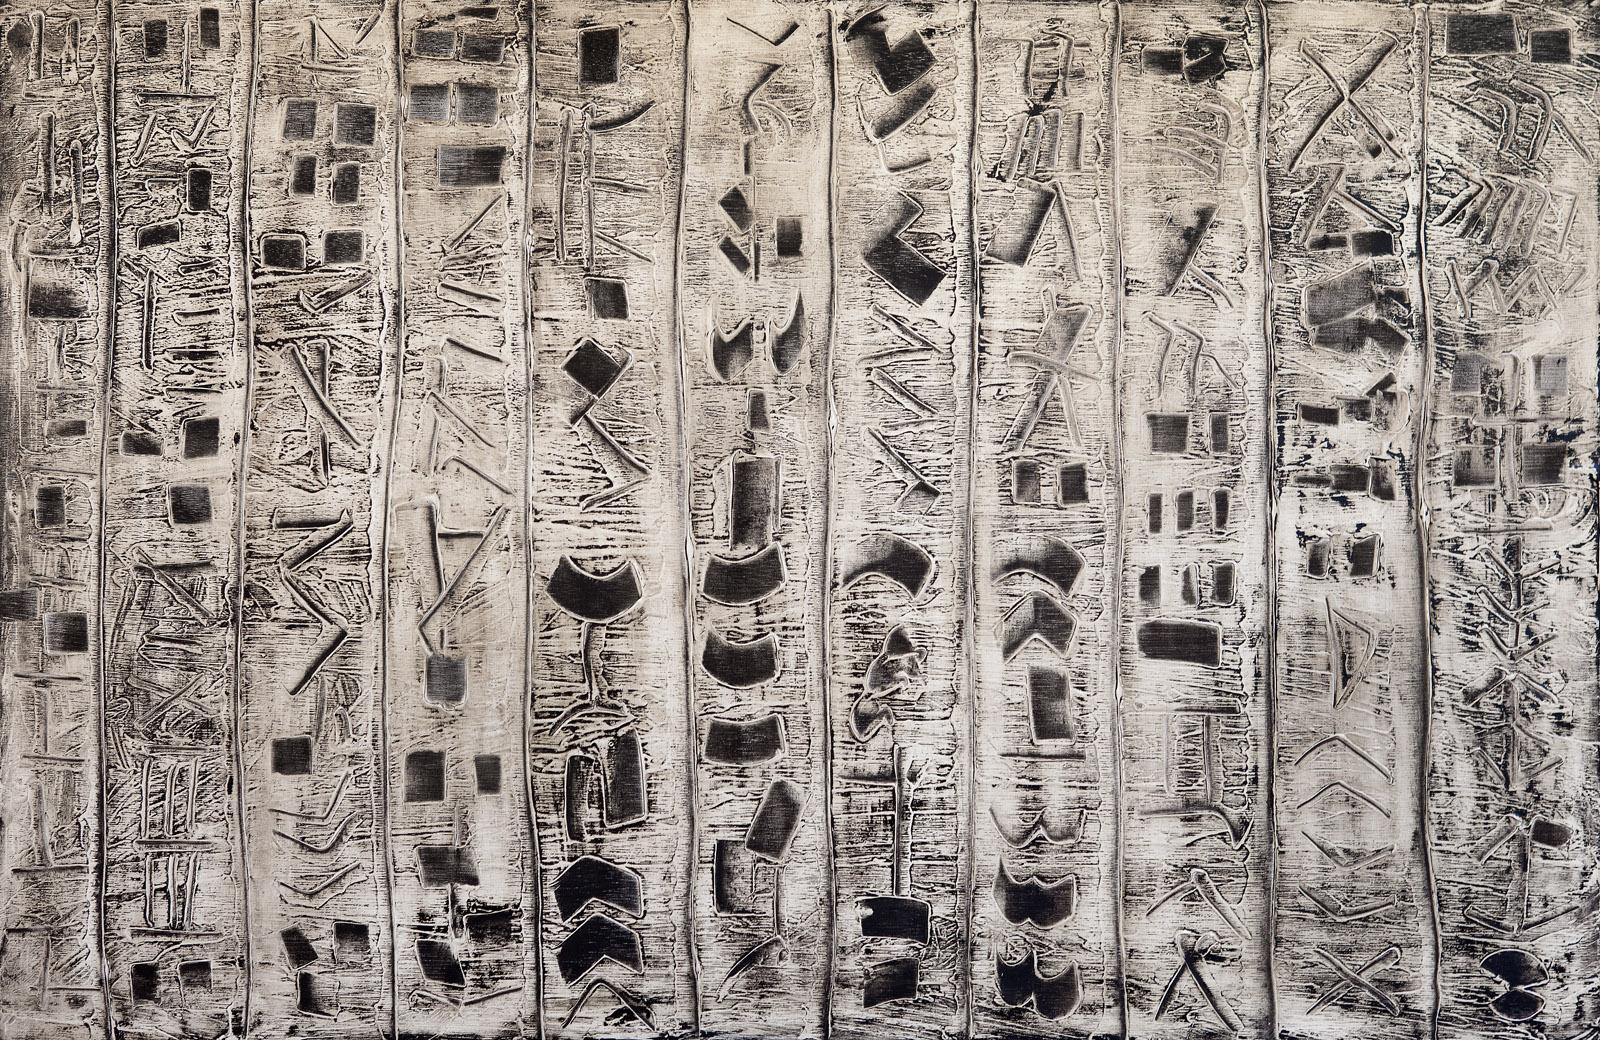 Ningirsu,_óleo_sobre_madera,_65x100cm,_2016.jpg